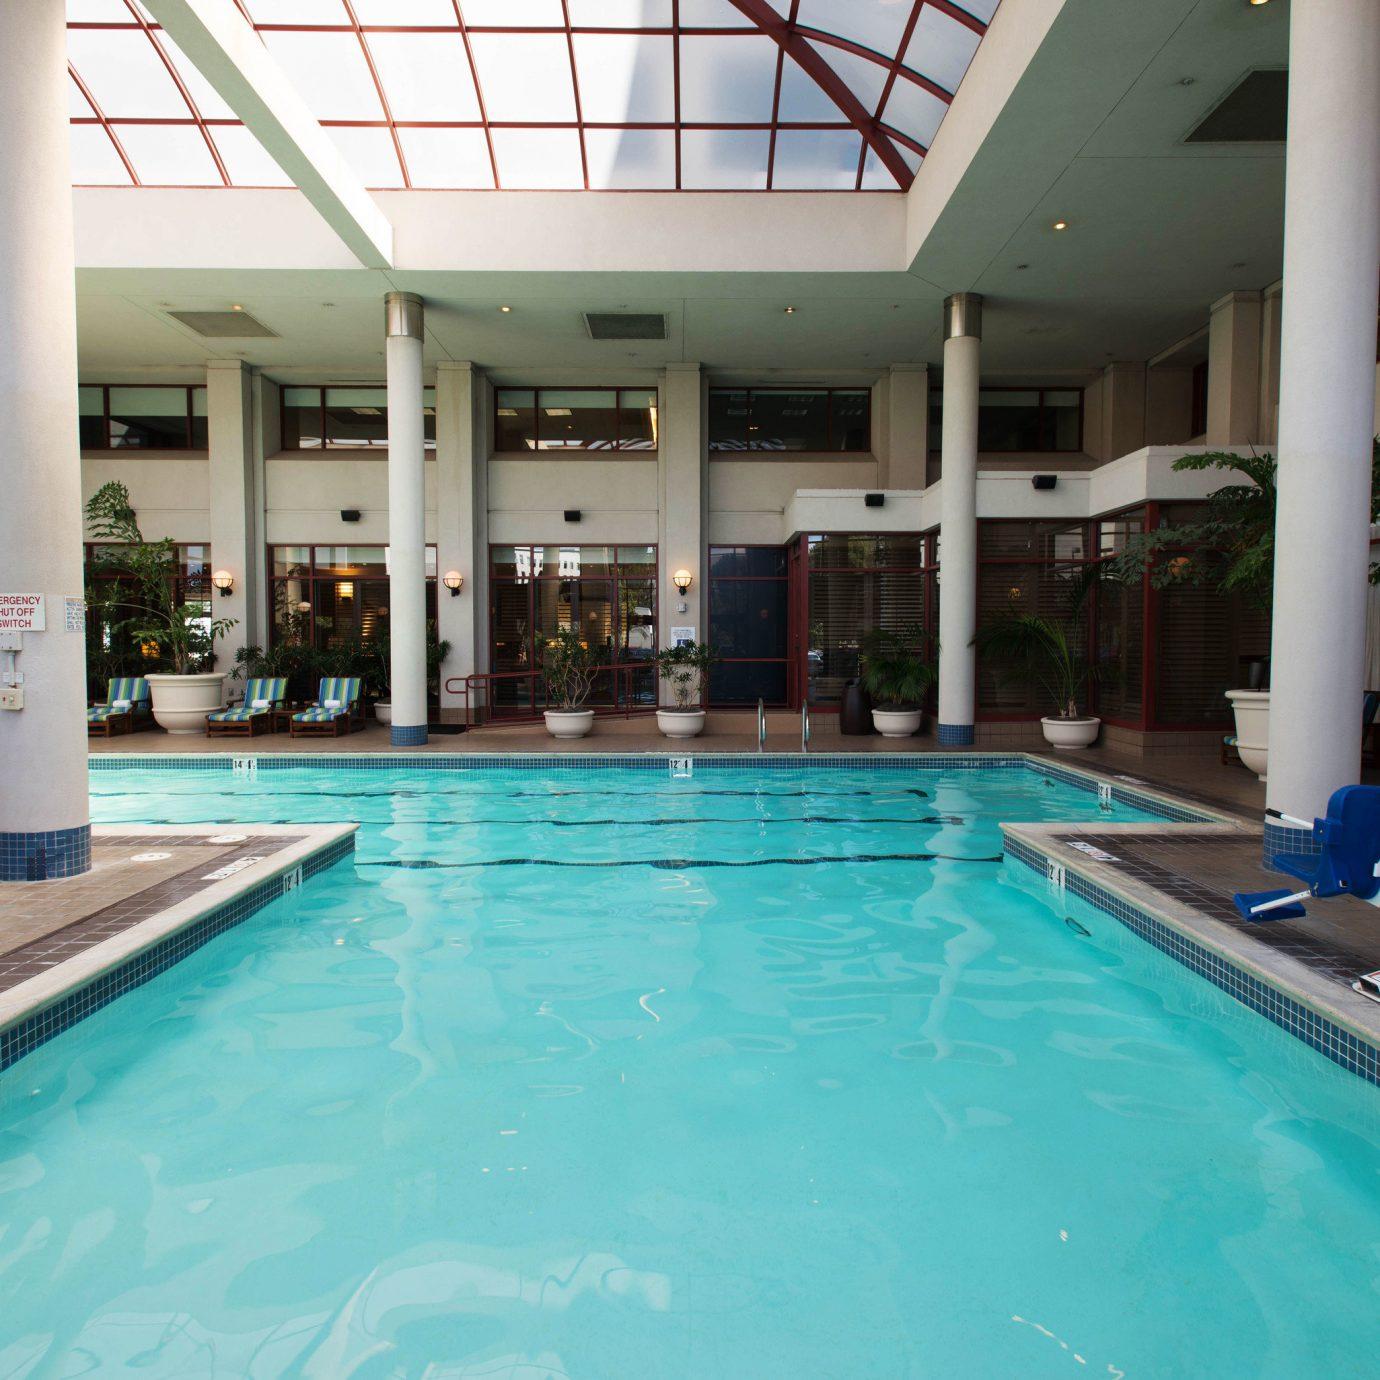 swimming pool building leisure Pool property Resort leisure centre condominium water sport Villa blue swimming